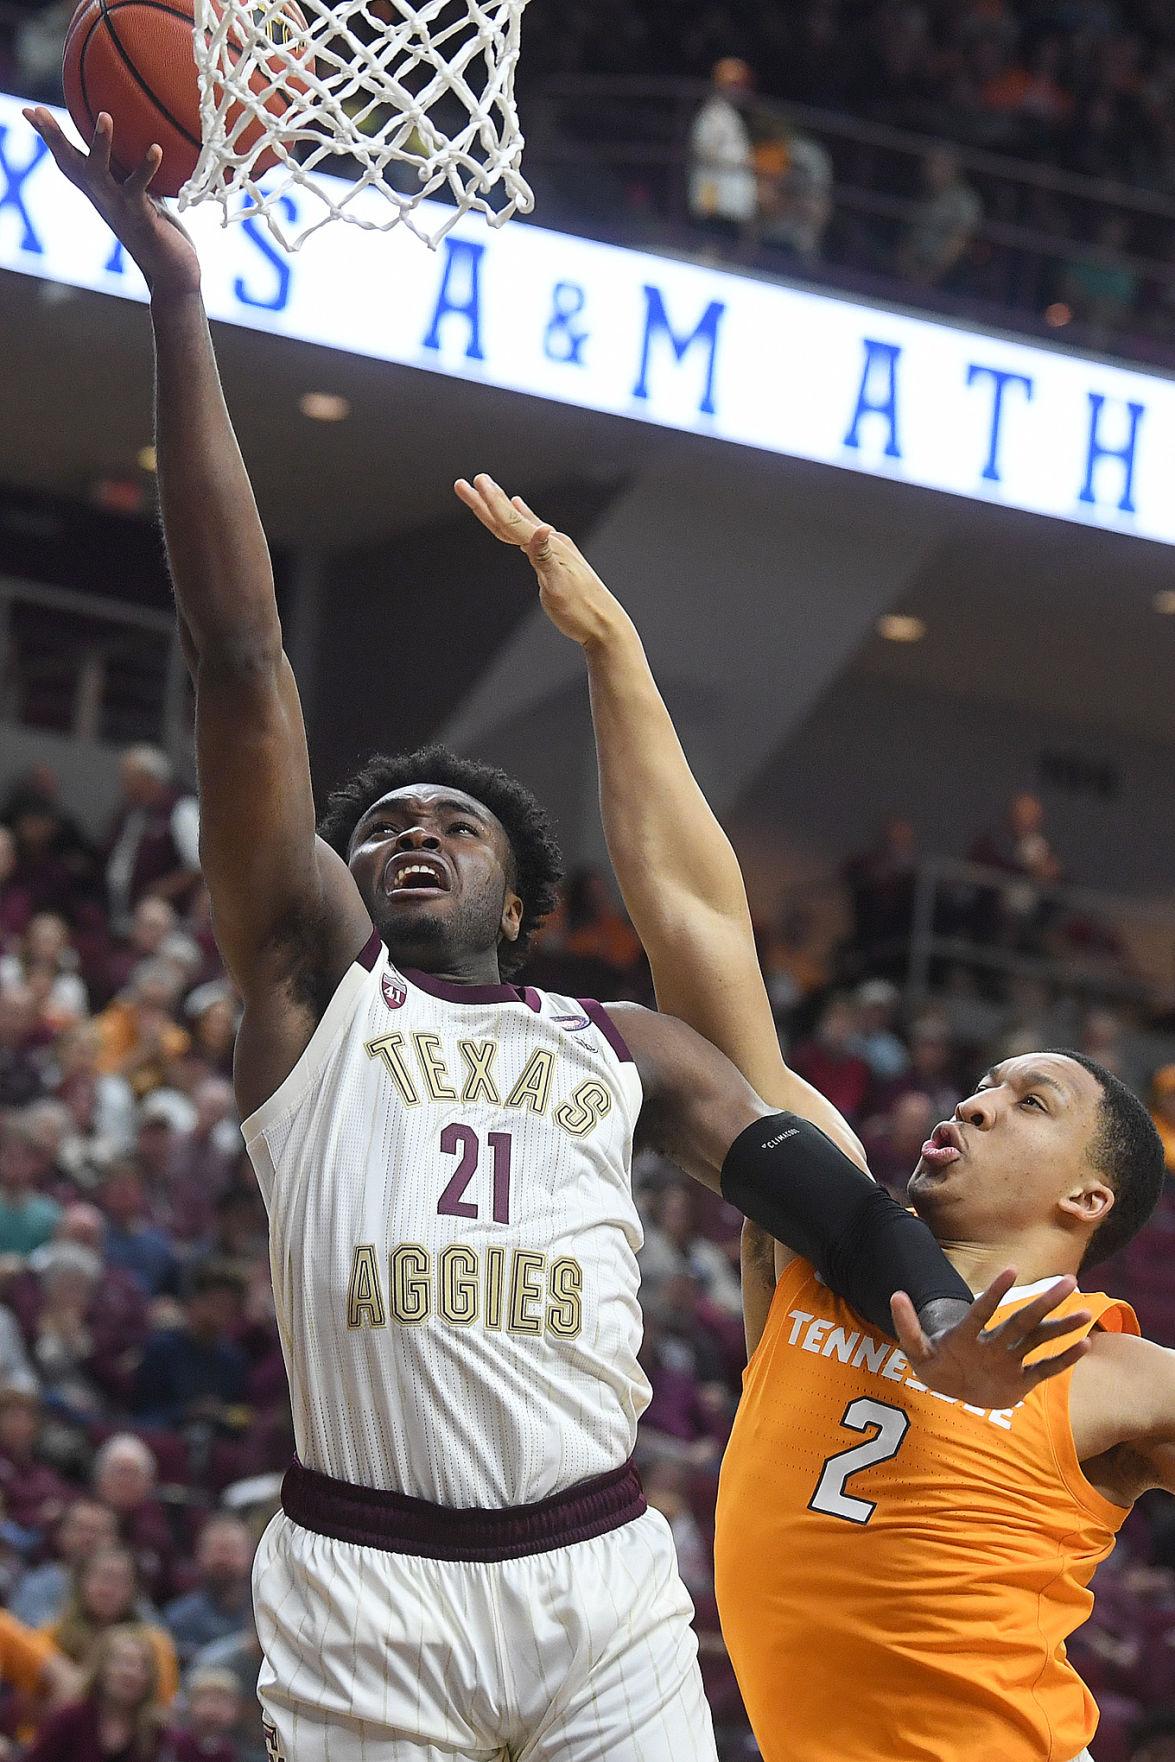 Texas A&M vs. Tennessee men's basketball